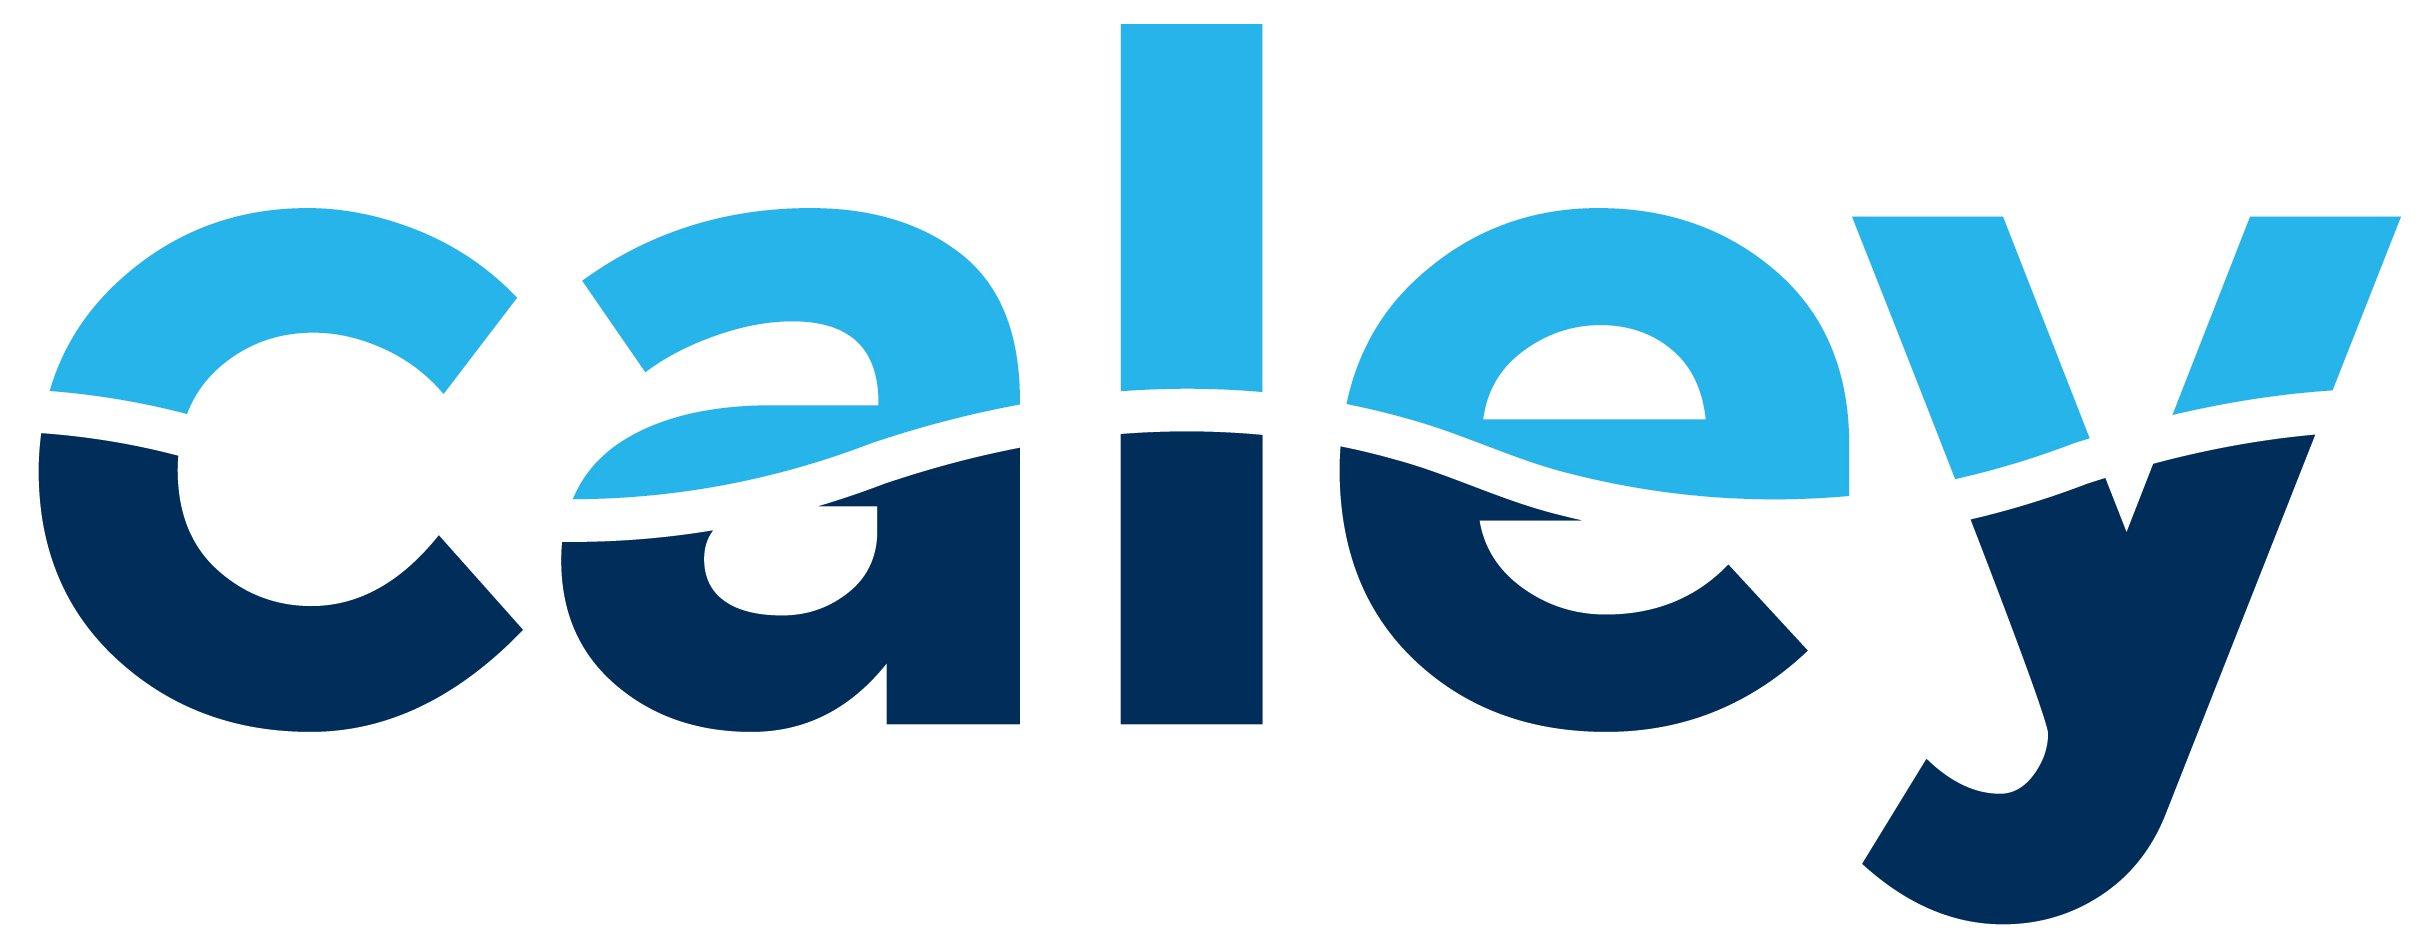 Caley Ocean Systems Logo. Armech Solutions client Logo.